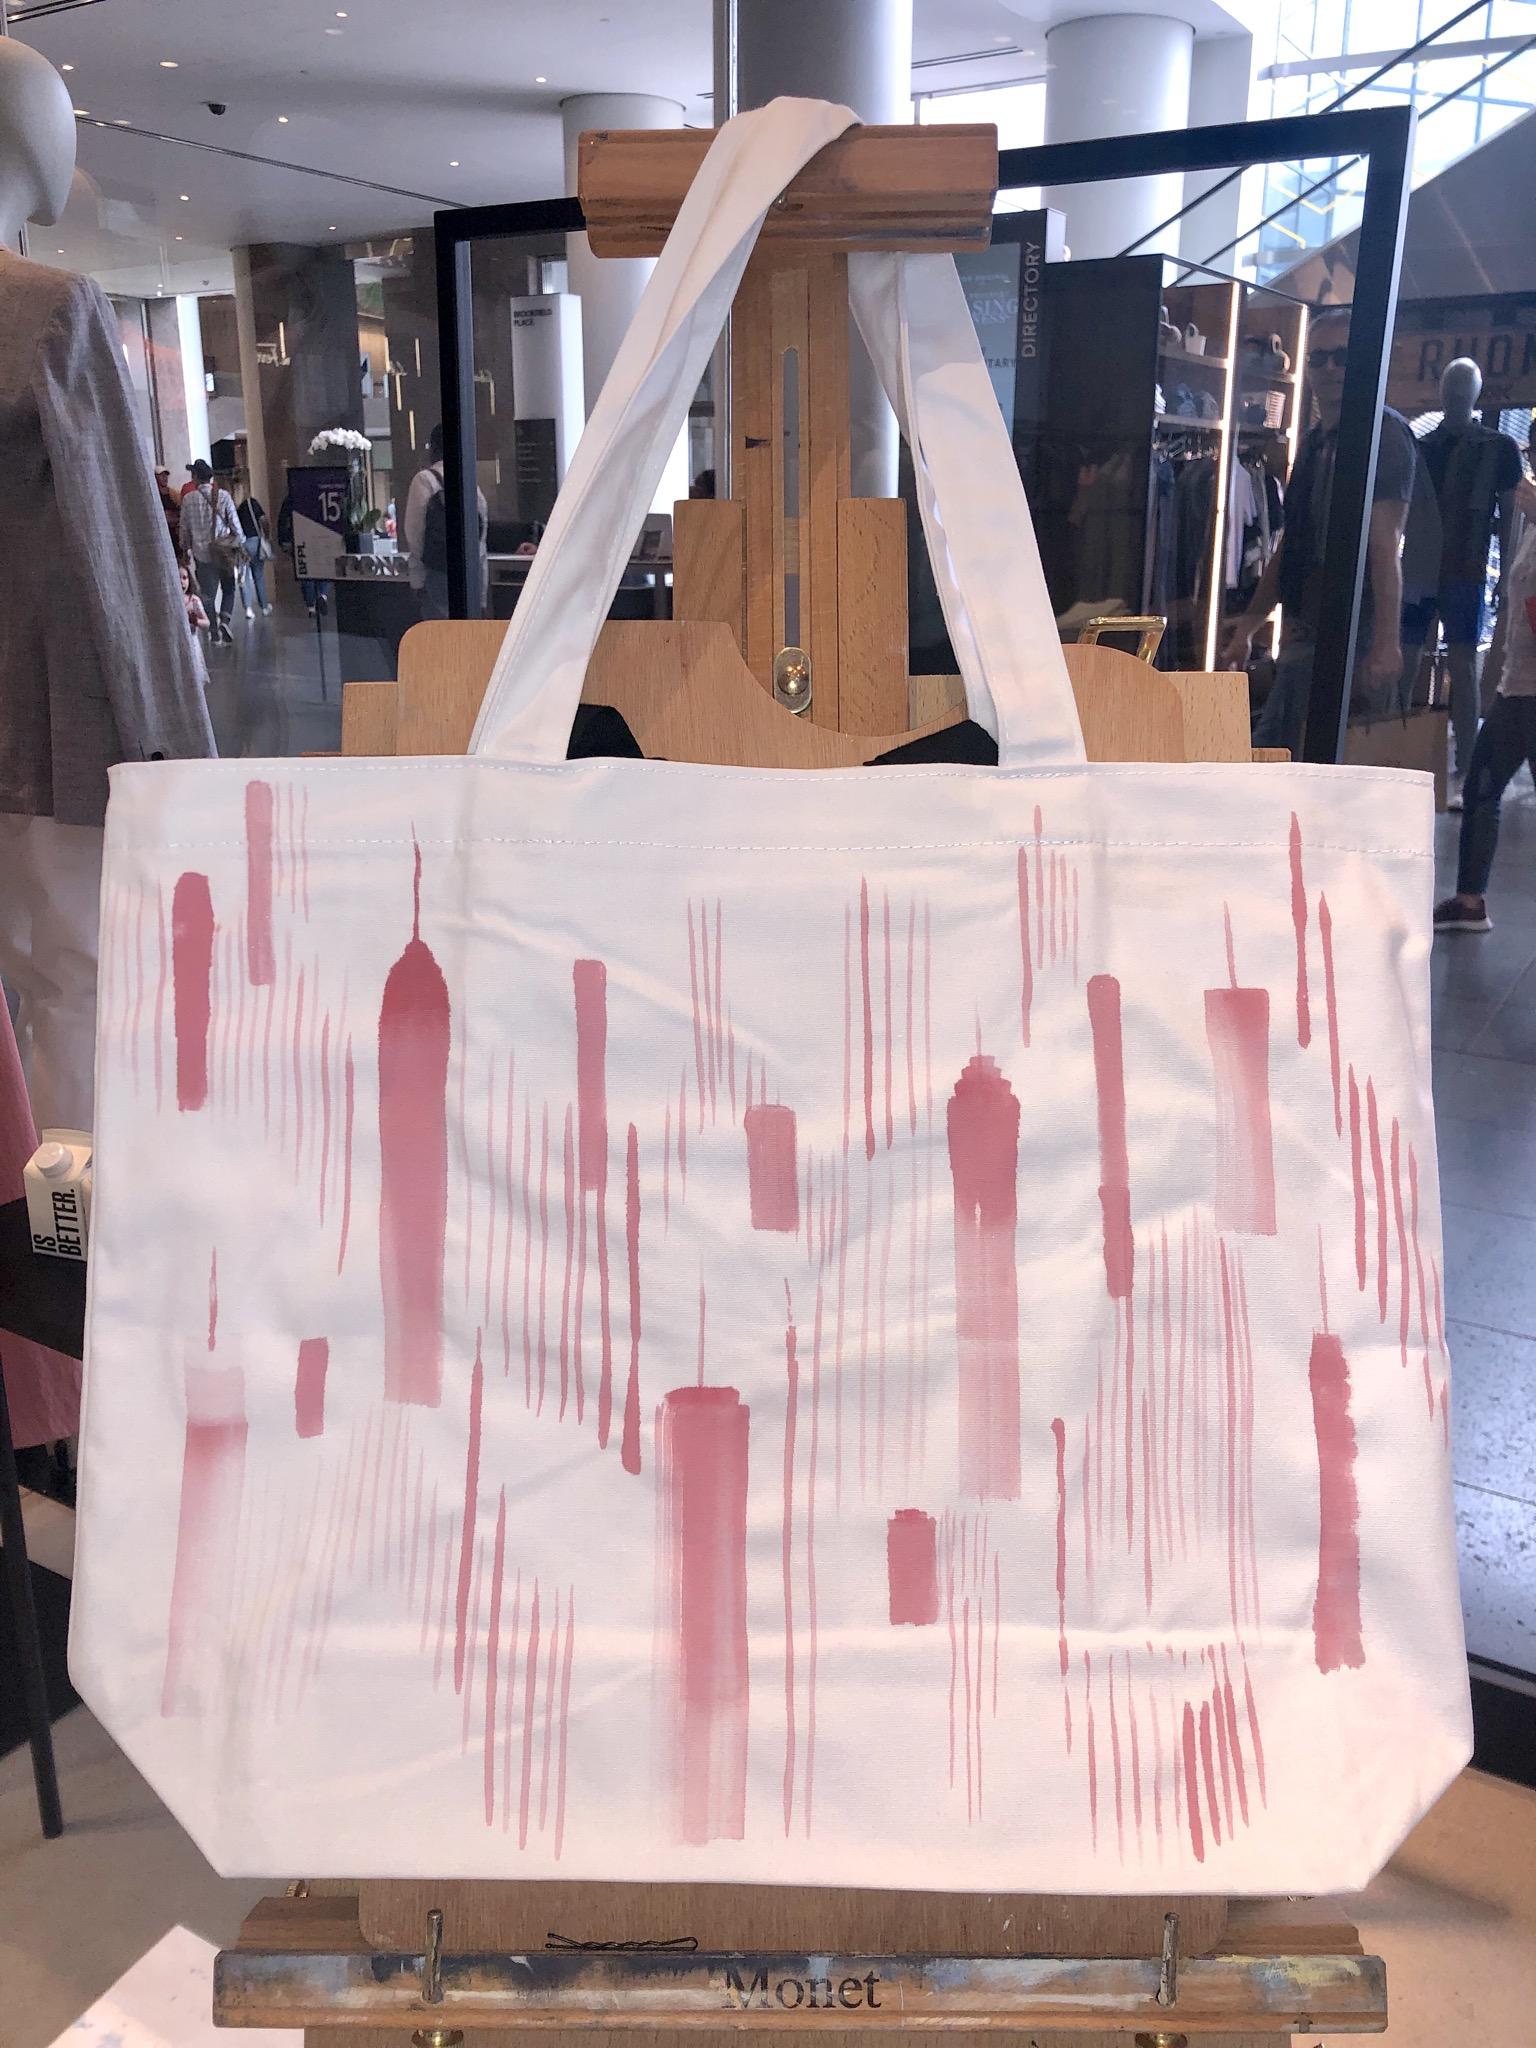 katrina-eugenia-theory-theory-clothing-theory-dress-theory-at-work-live-painting-live-art-live-artist-nyc-live-painter-nyc33.jpeg